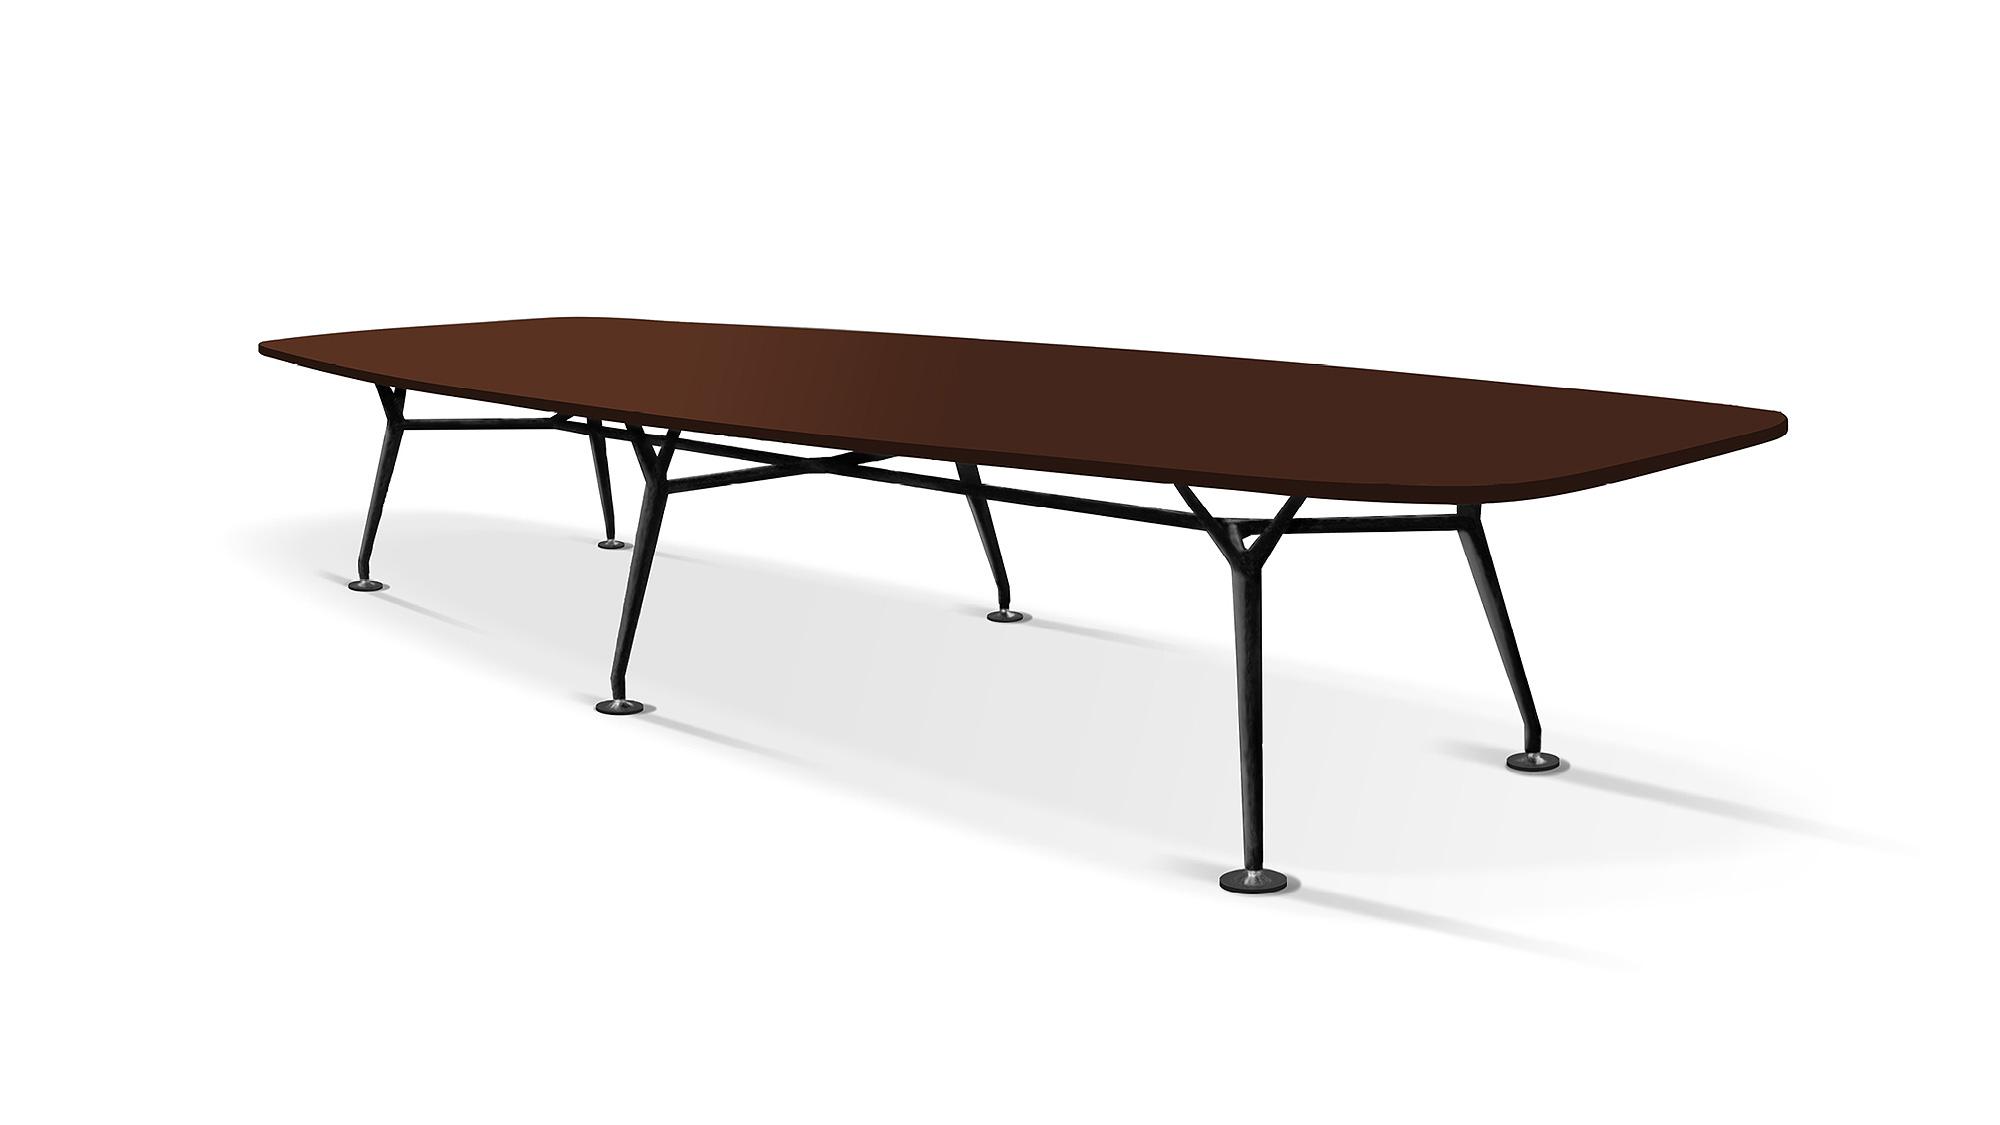 Leonardo r thlisberger kollektion swiss designer furniture for Design furniture replica switzerland